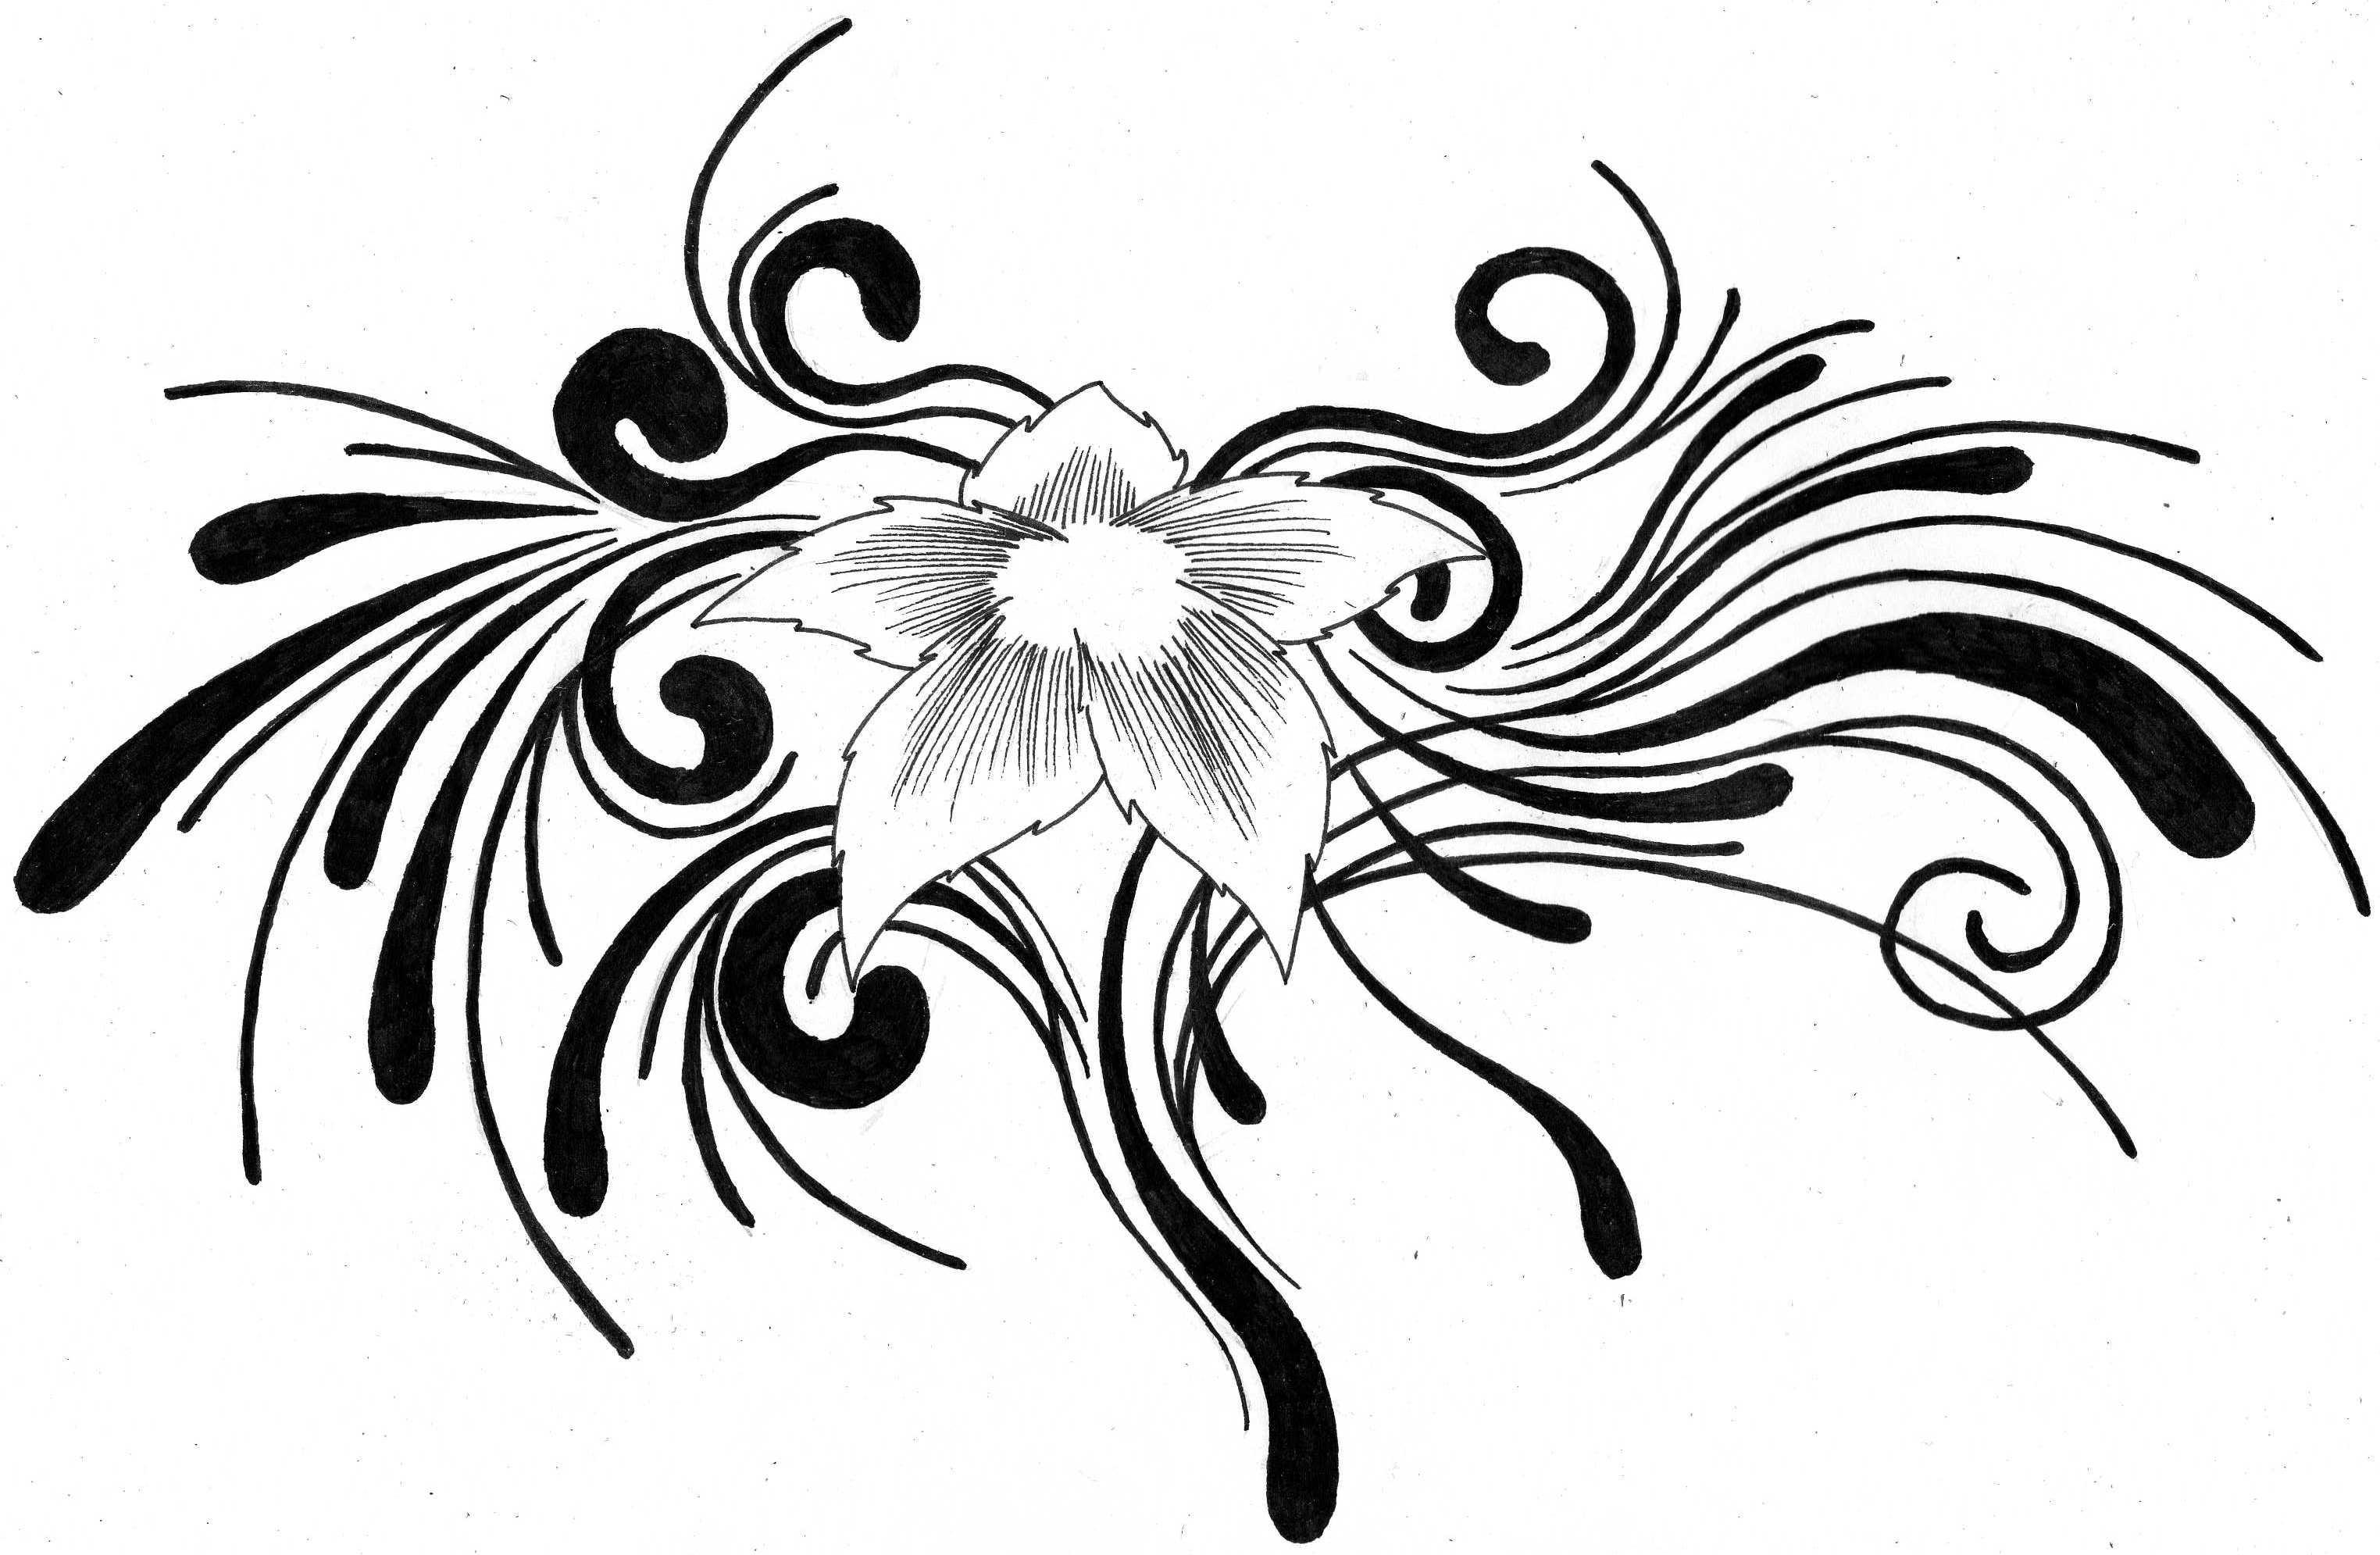 Free Tribal Bunga, Download Free Clip Art, Free Clip Art on Clipart.